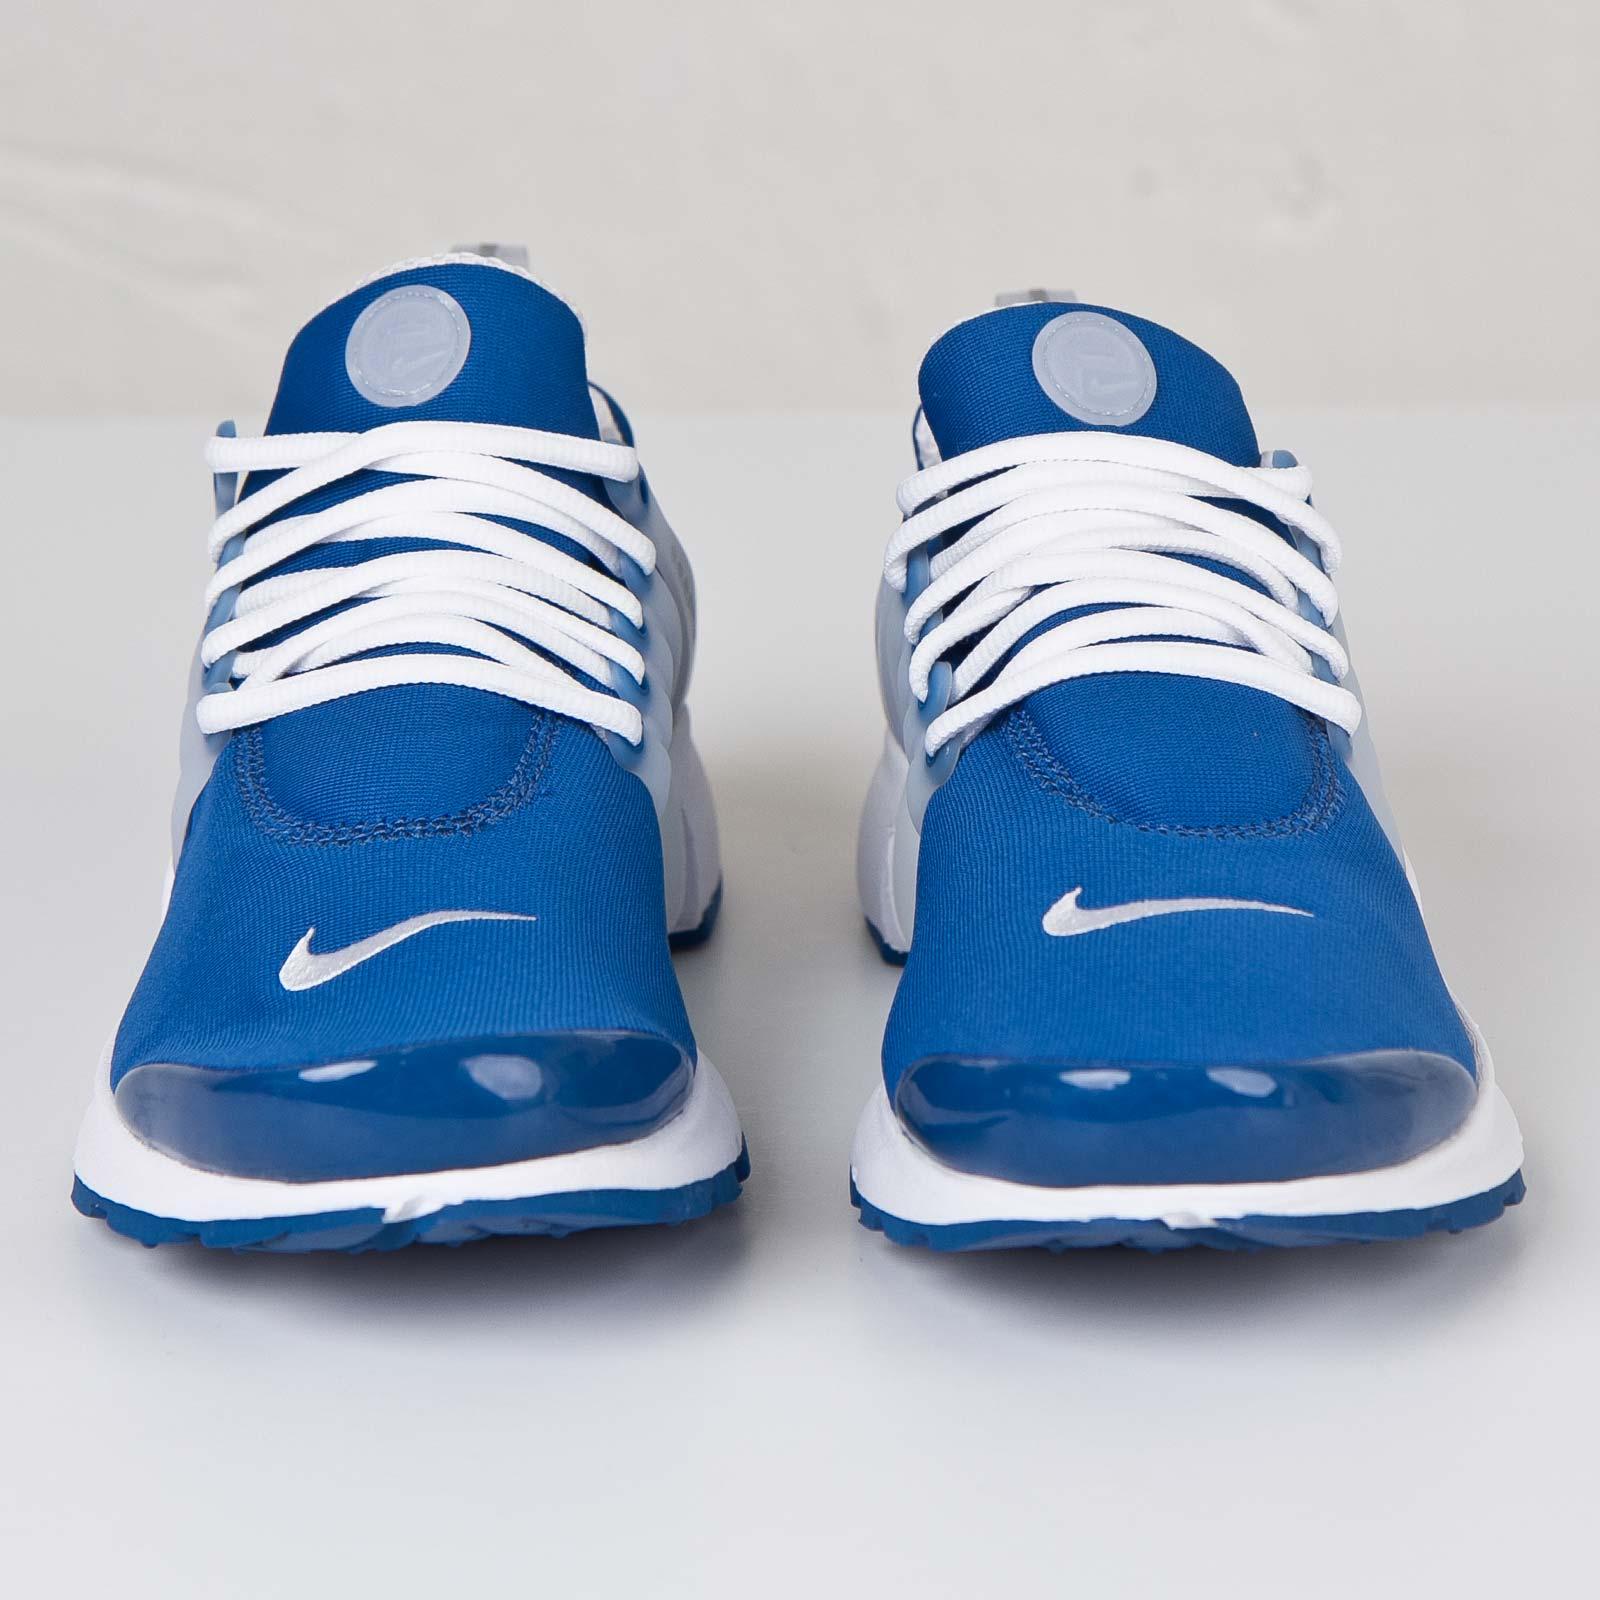 Nike Air Presto QS Schuhe Blau Weiß HerrenDamen